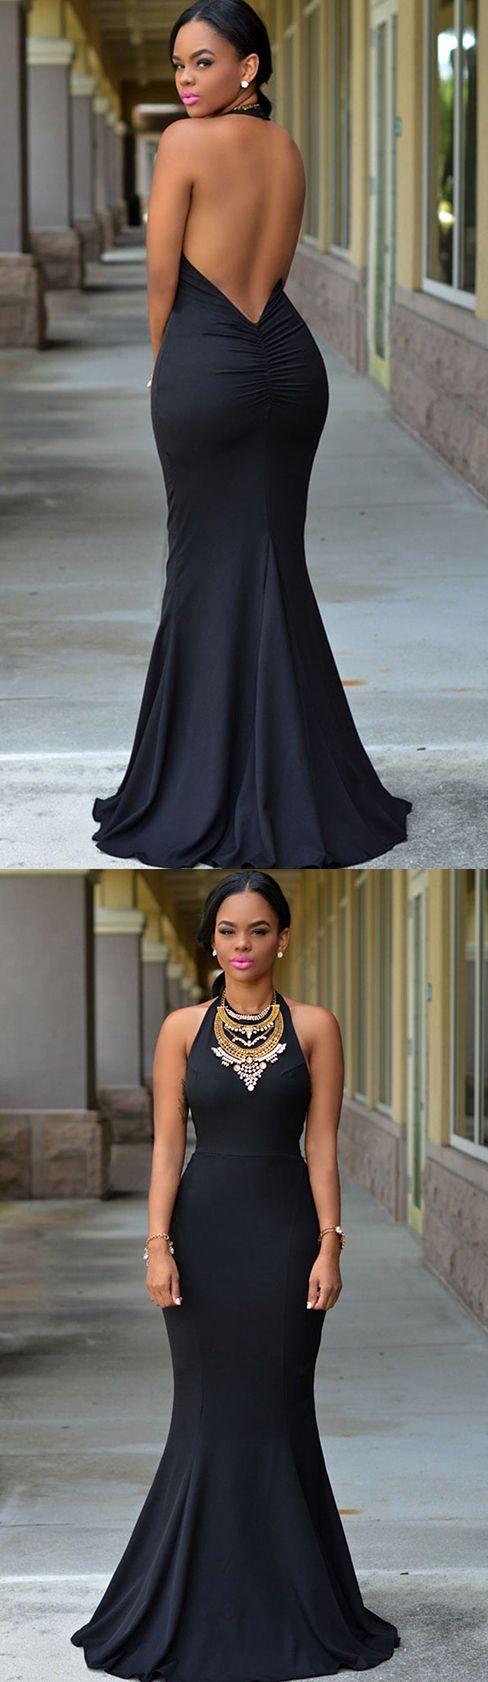 $44.99 Halter Daring Back Gown